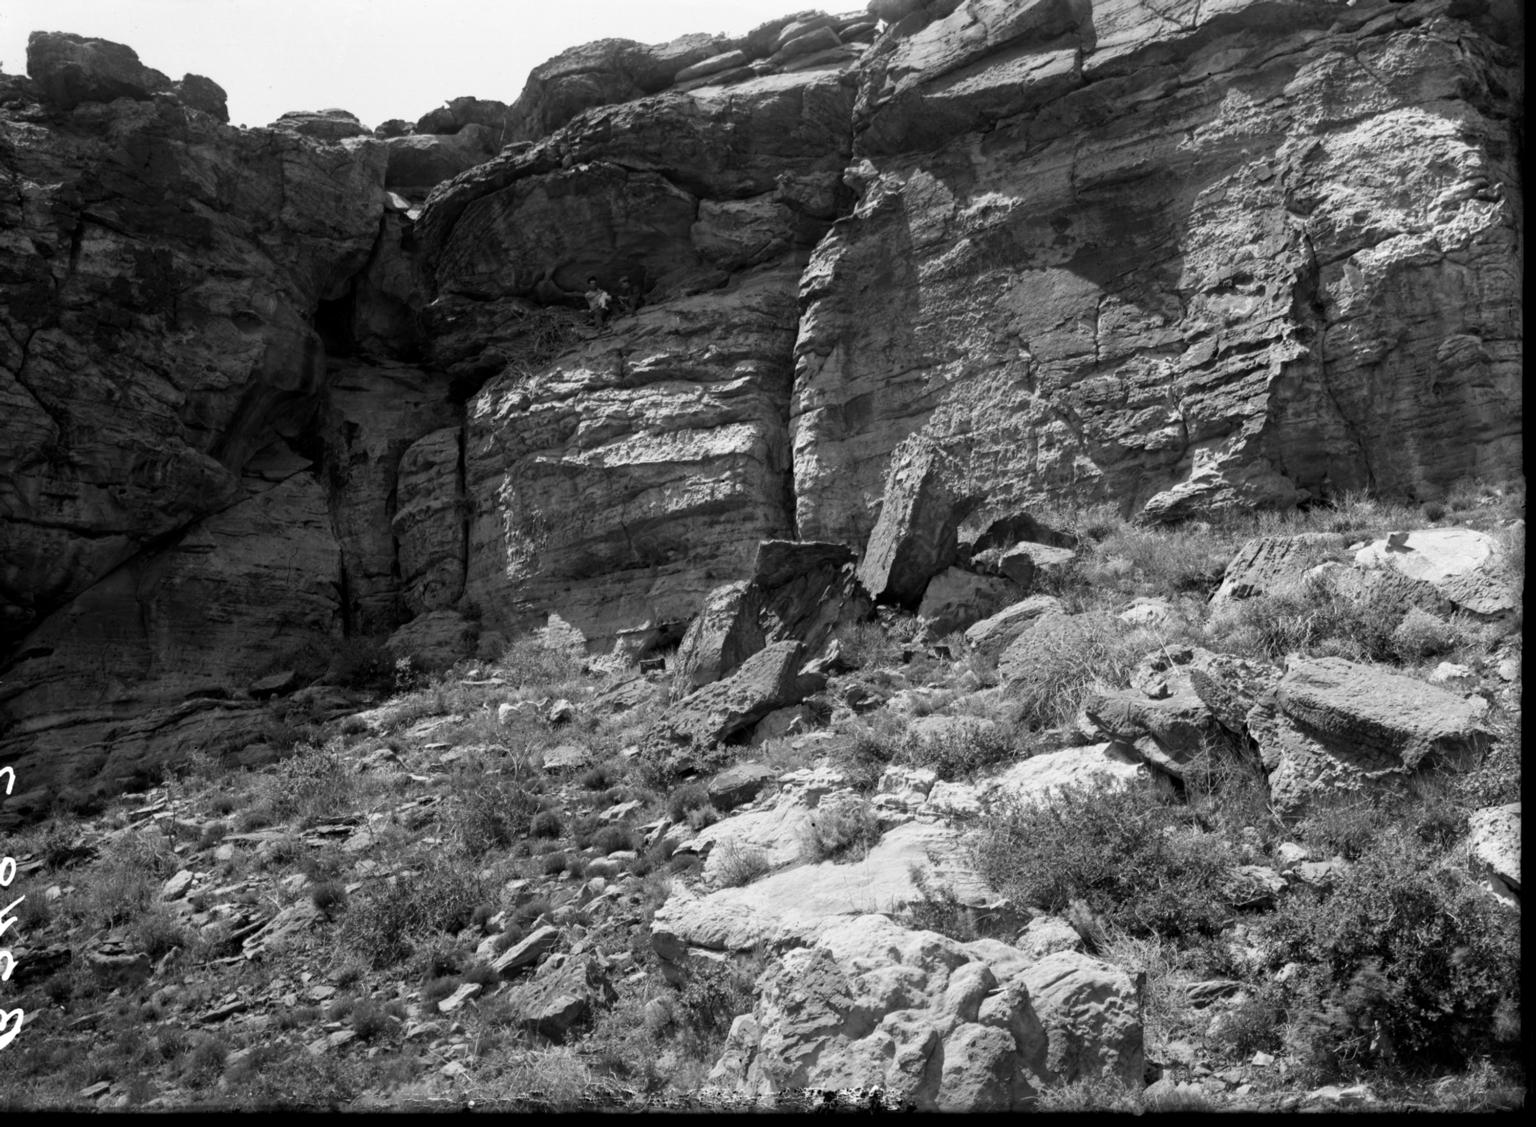 Ascent to Eagle Nest